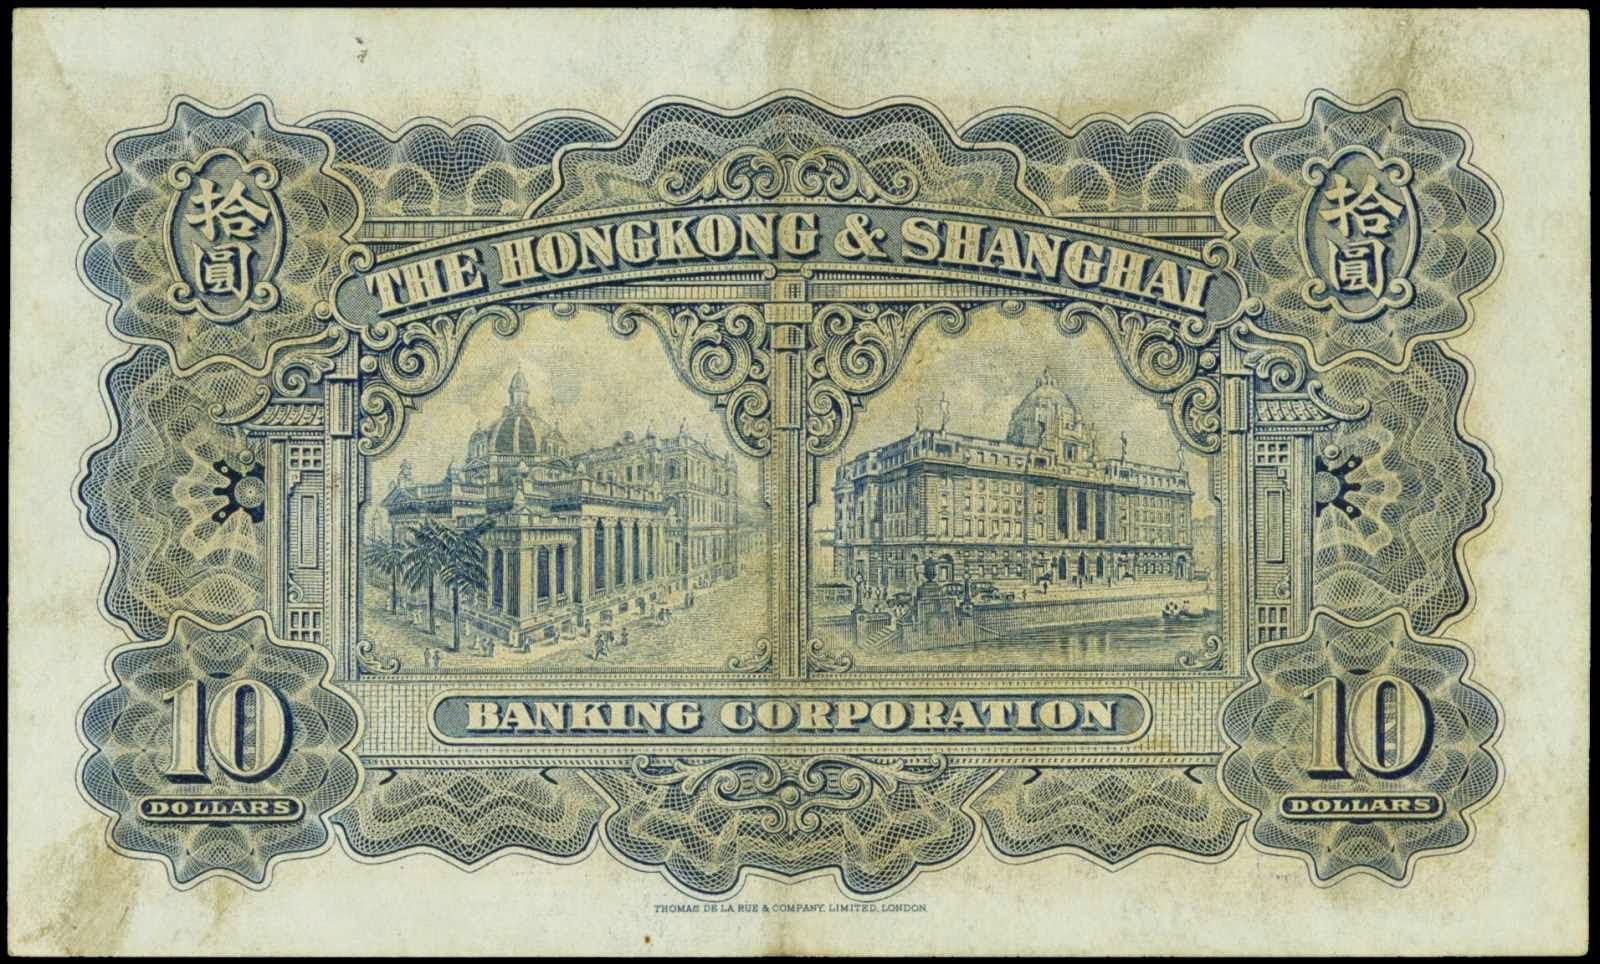 Hong Kong Shanghai Banking Corporation Ten Dollars banknote